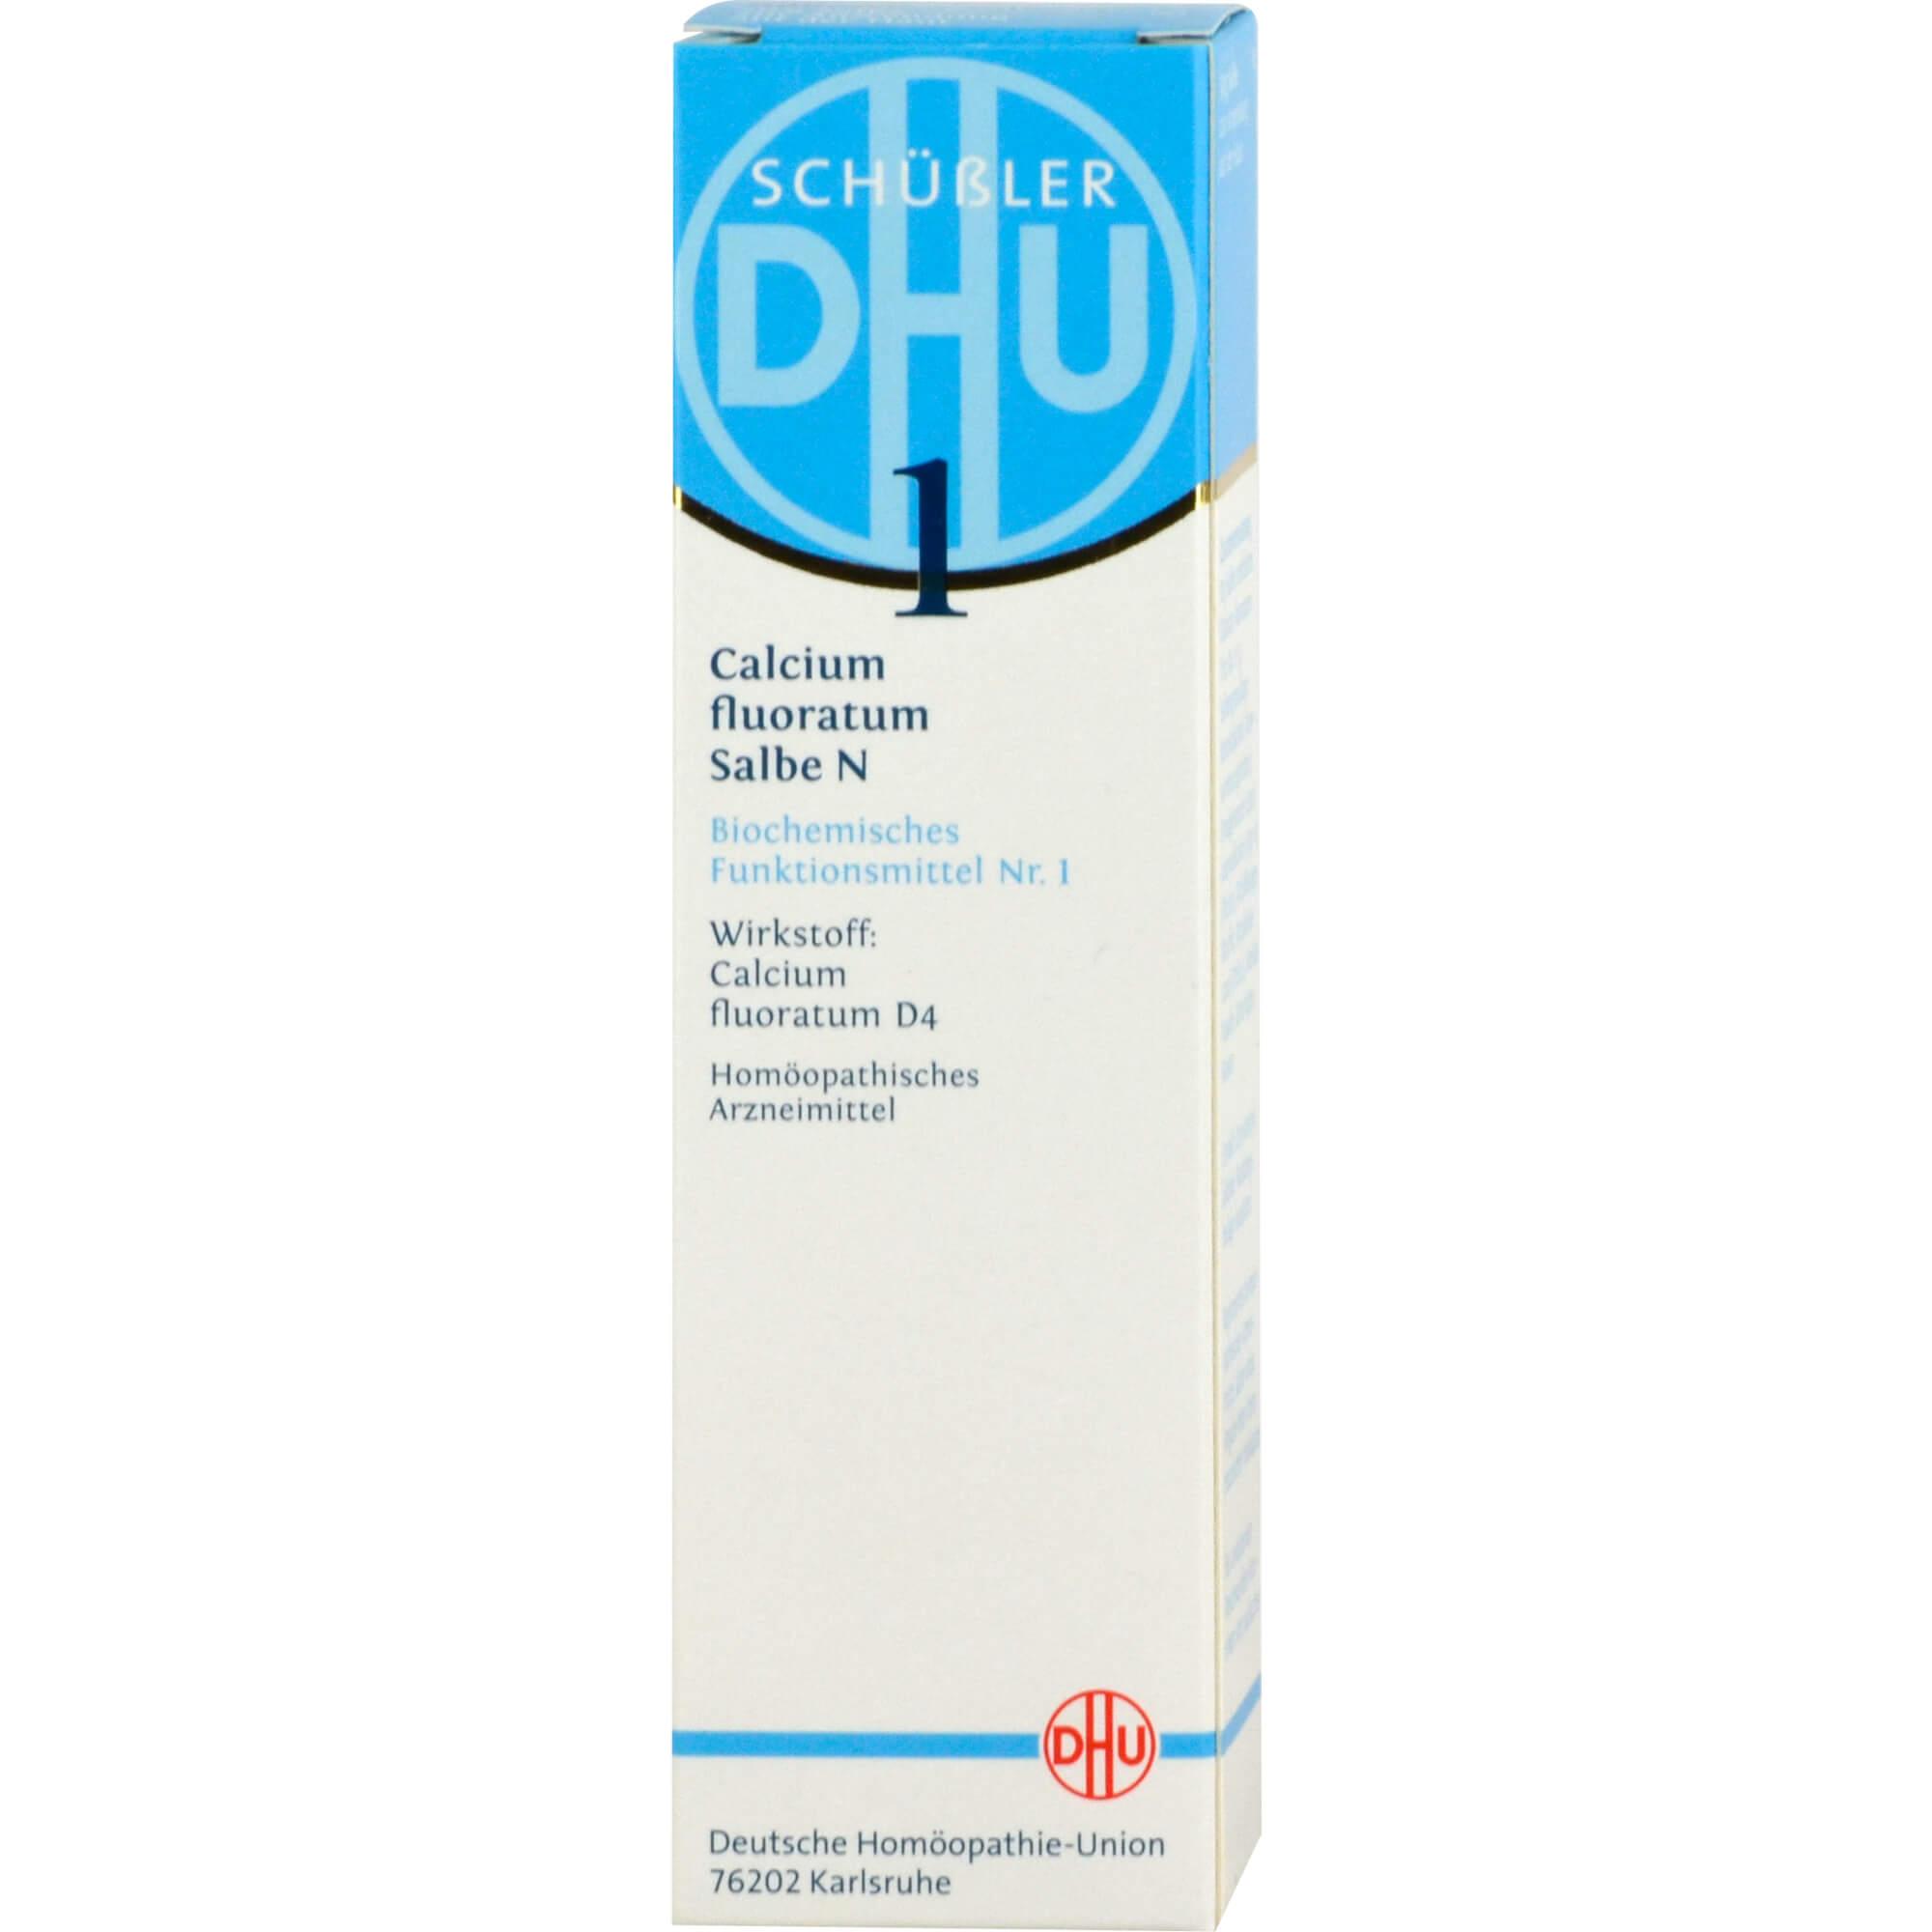 BIOCHEMIE DHU 1 Calcium fluoratum N D 4 Salbe